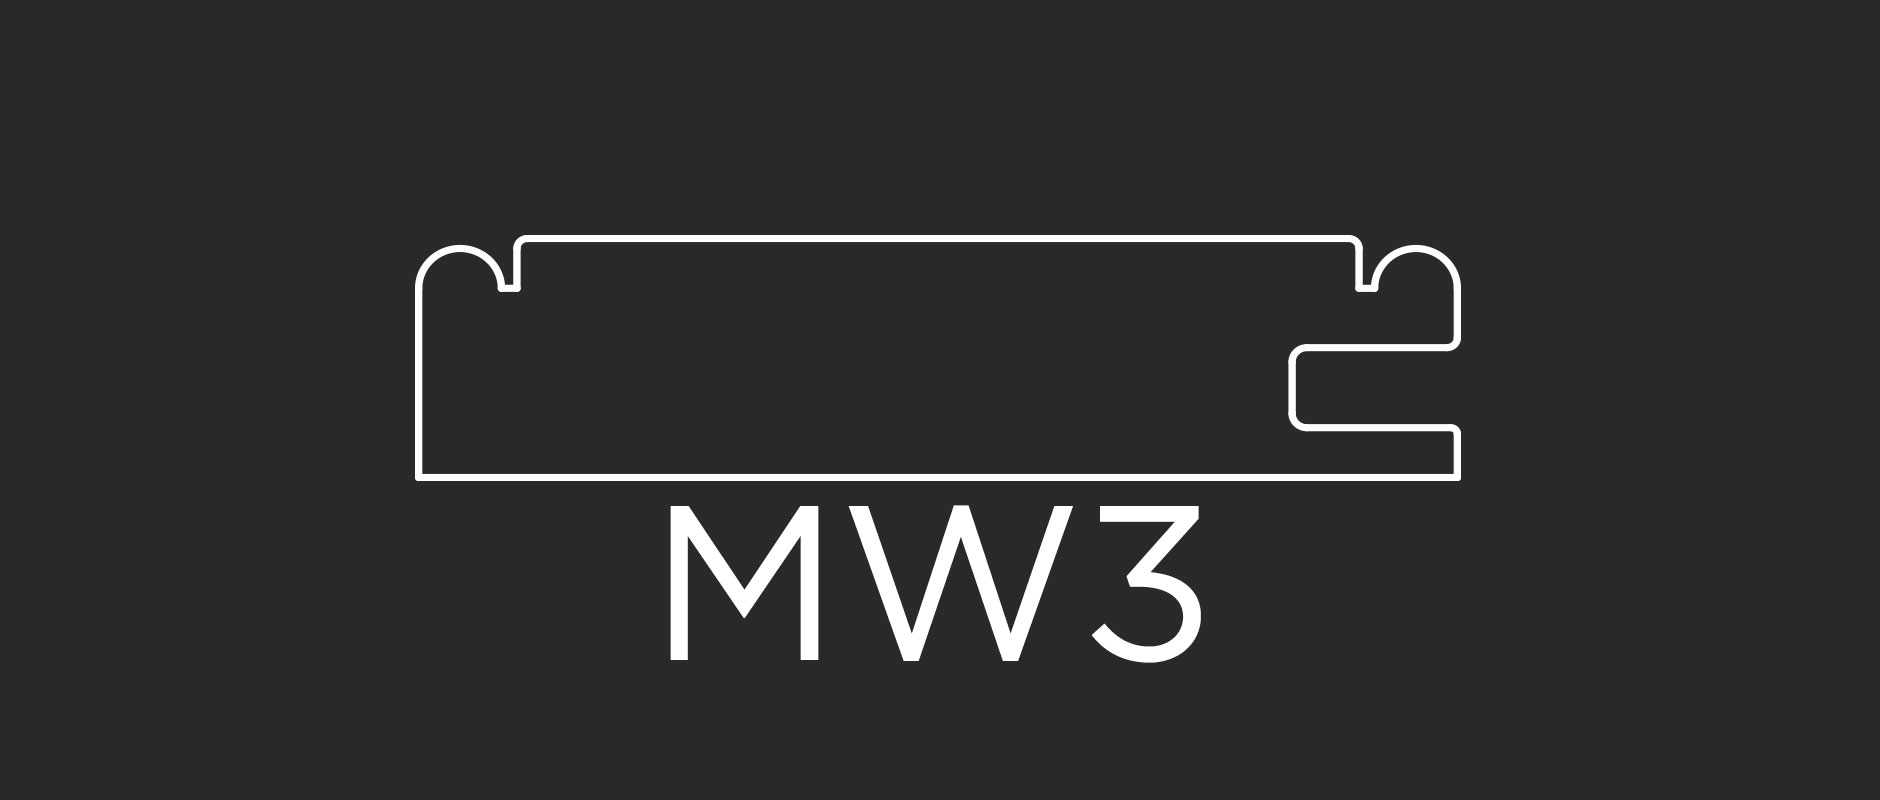 "MW3 mitered frame 3-1/8"" wide"